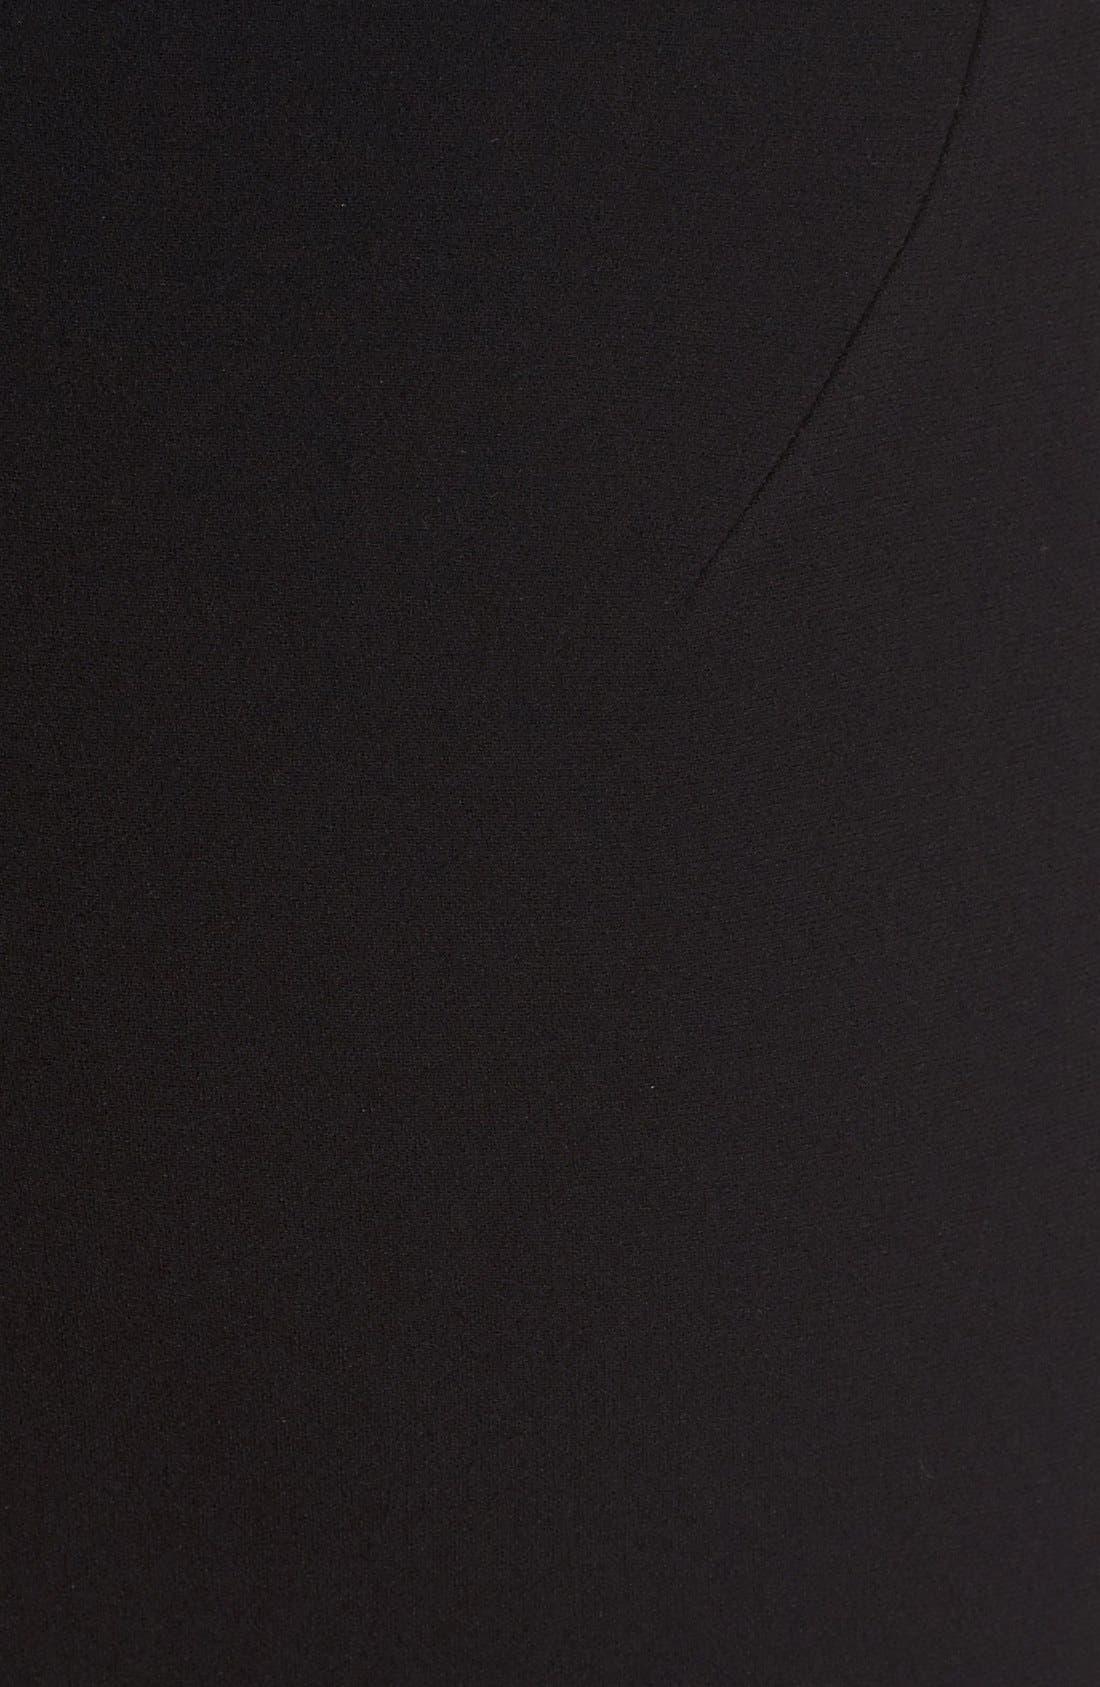 Alternate Image 3  - Victoria Beckham Sheer Inset Crepe Tulle Dress